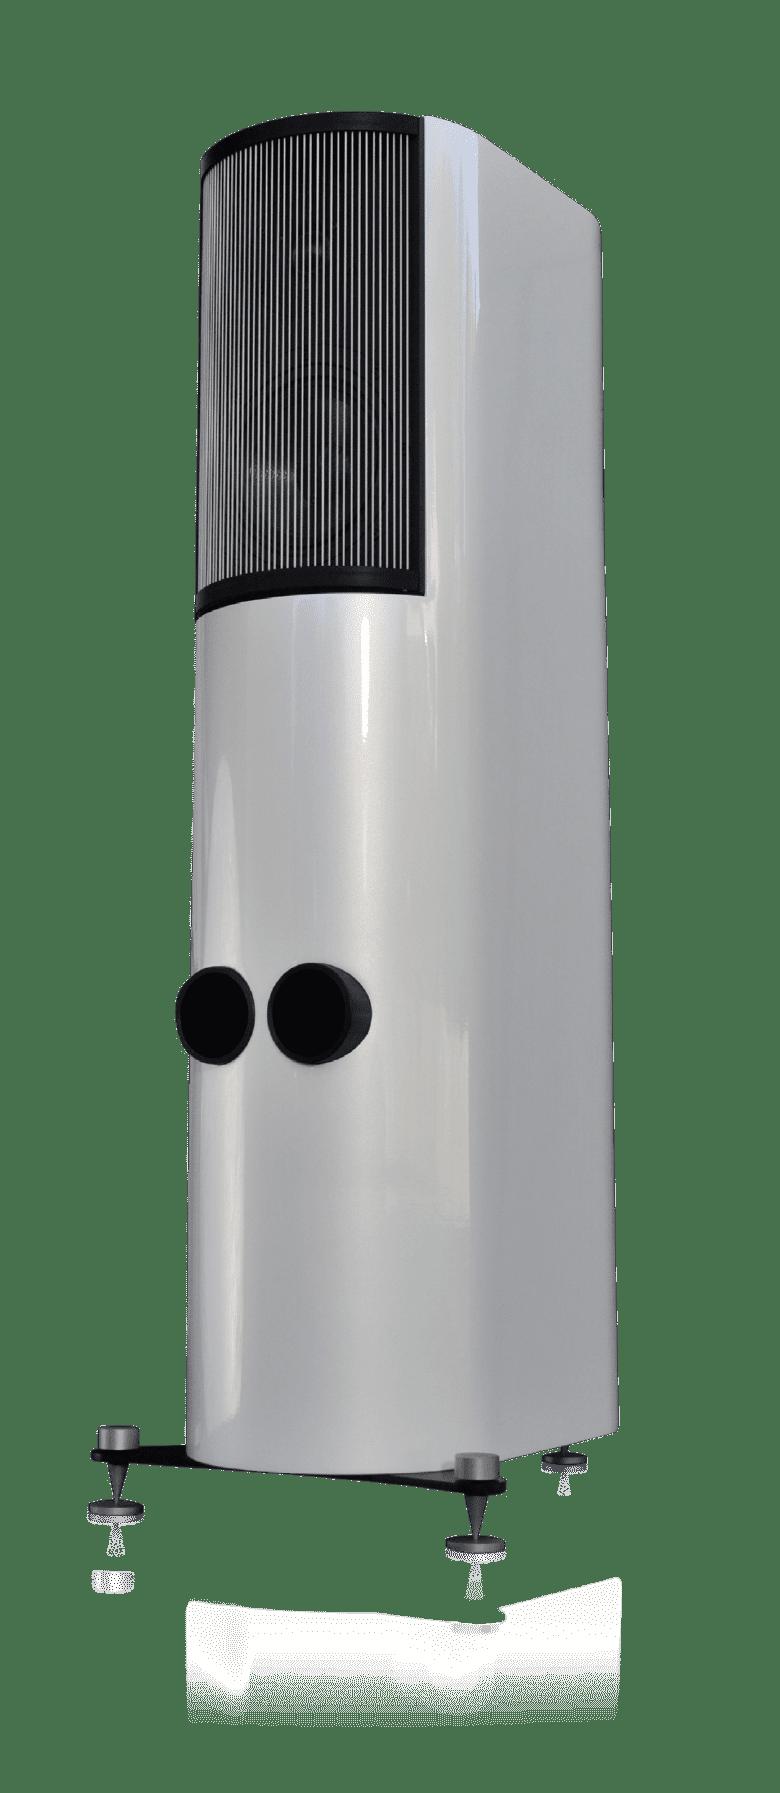 Gallus Audio High-Fidelity Speaker